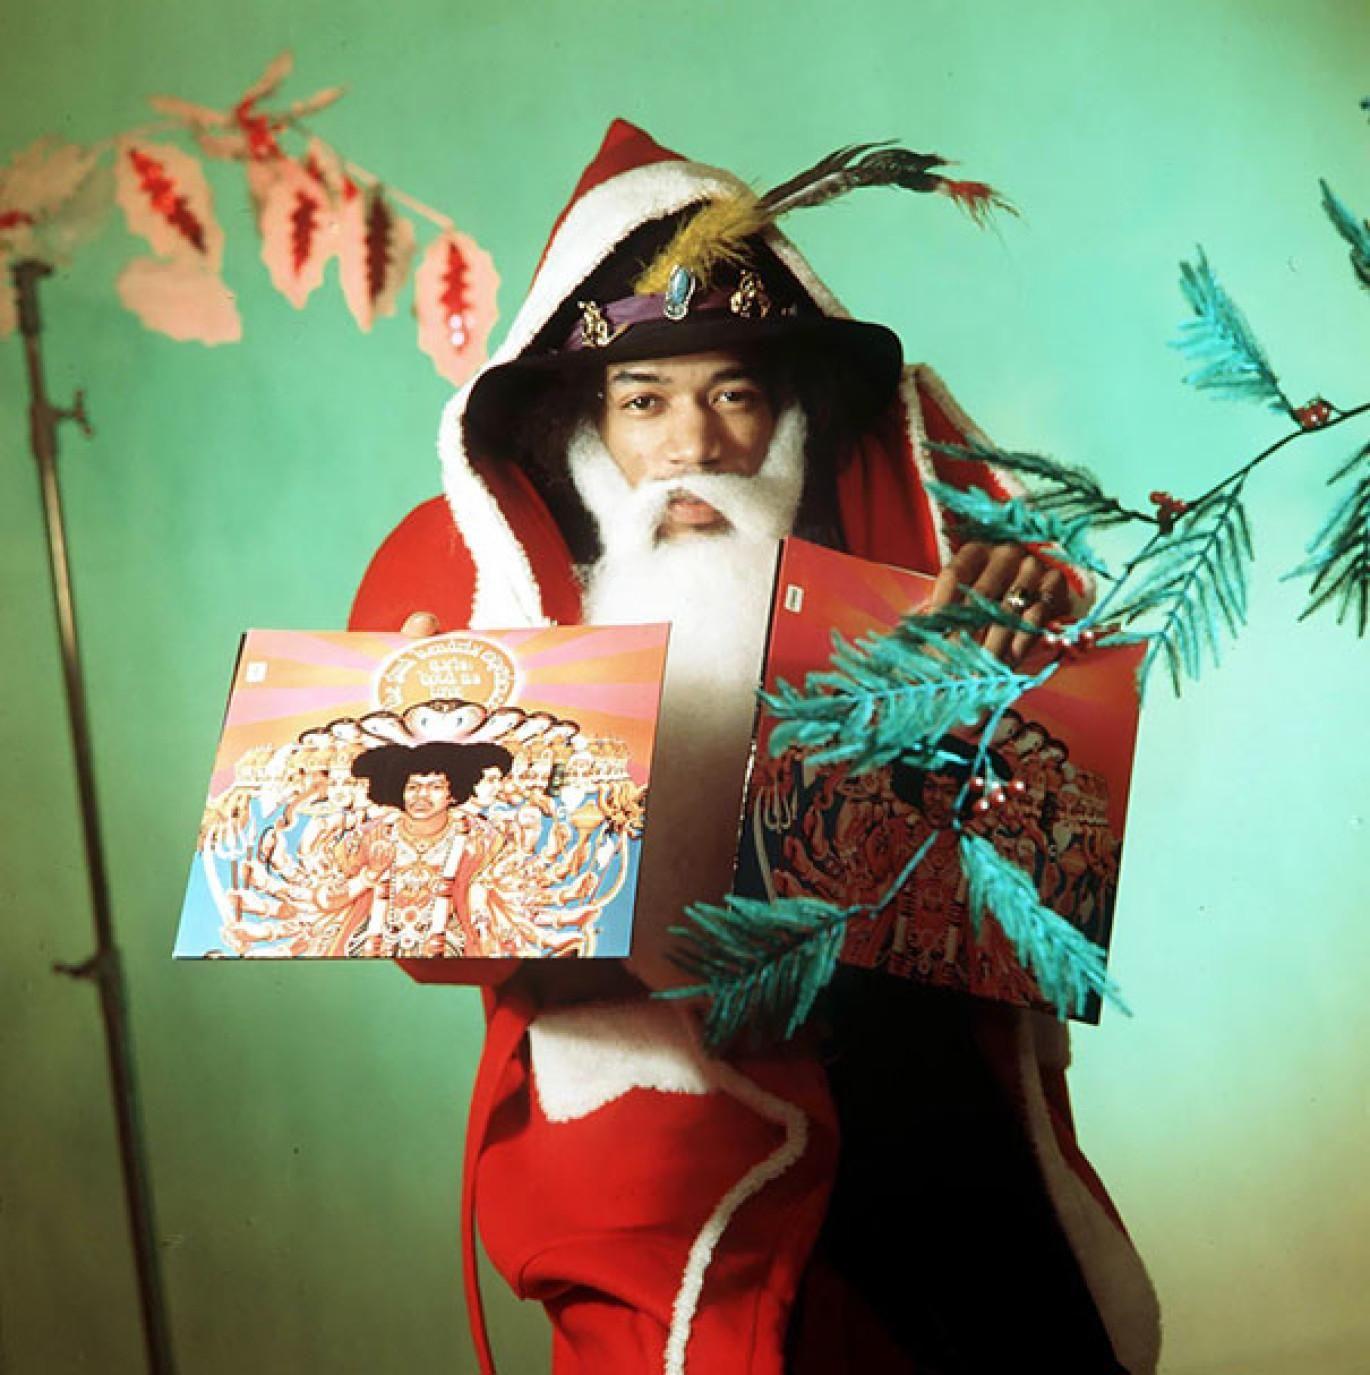 Jimi Hendrix dressed as Santa Claus (1967) | OldSchoolCool 3.0 ...